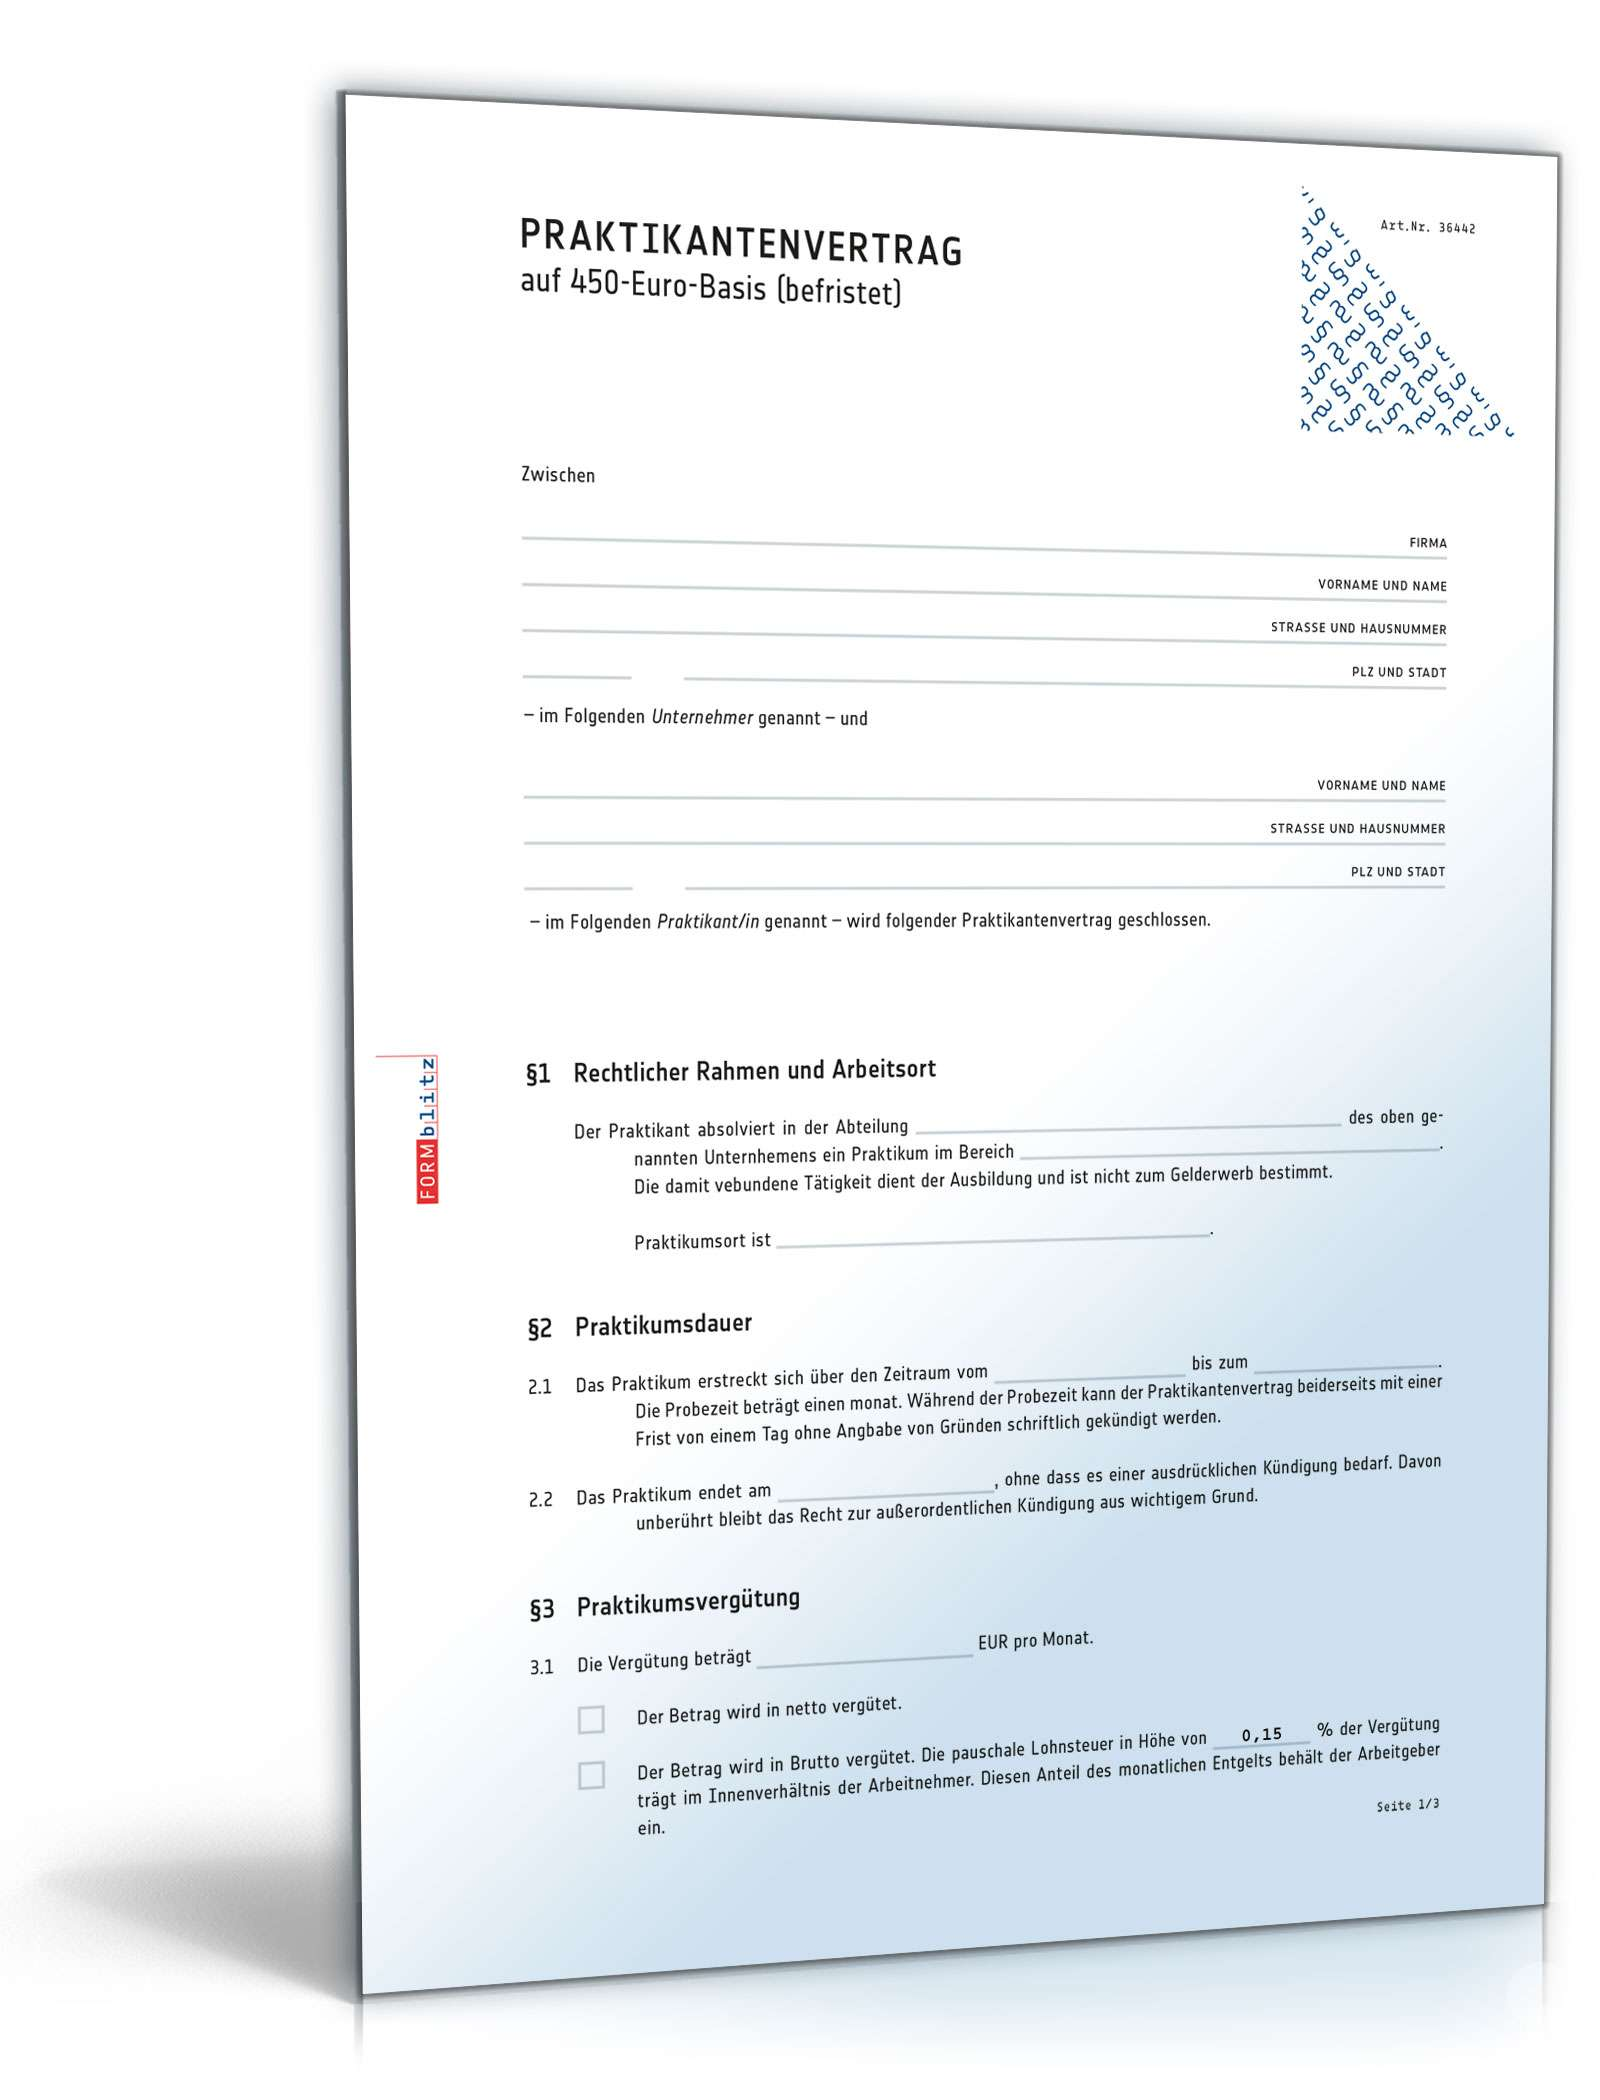 Praktikantenvertrag Minijob Muster Zum Download